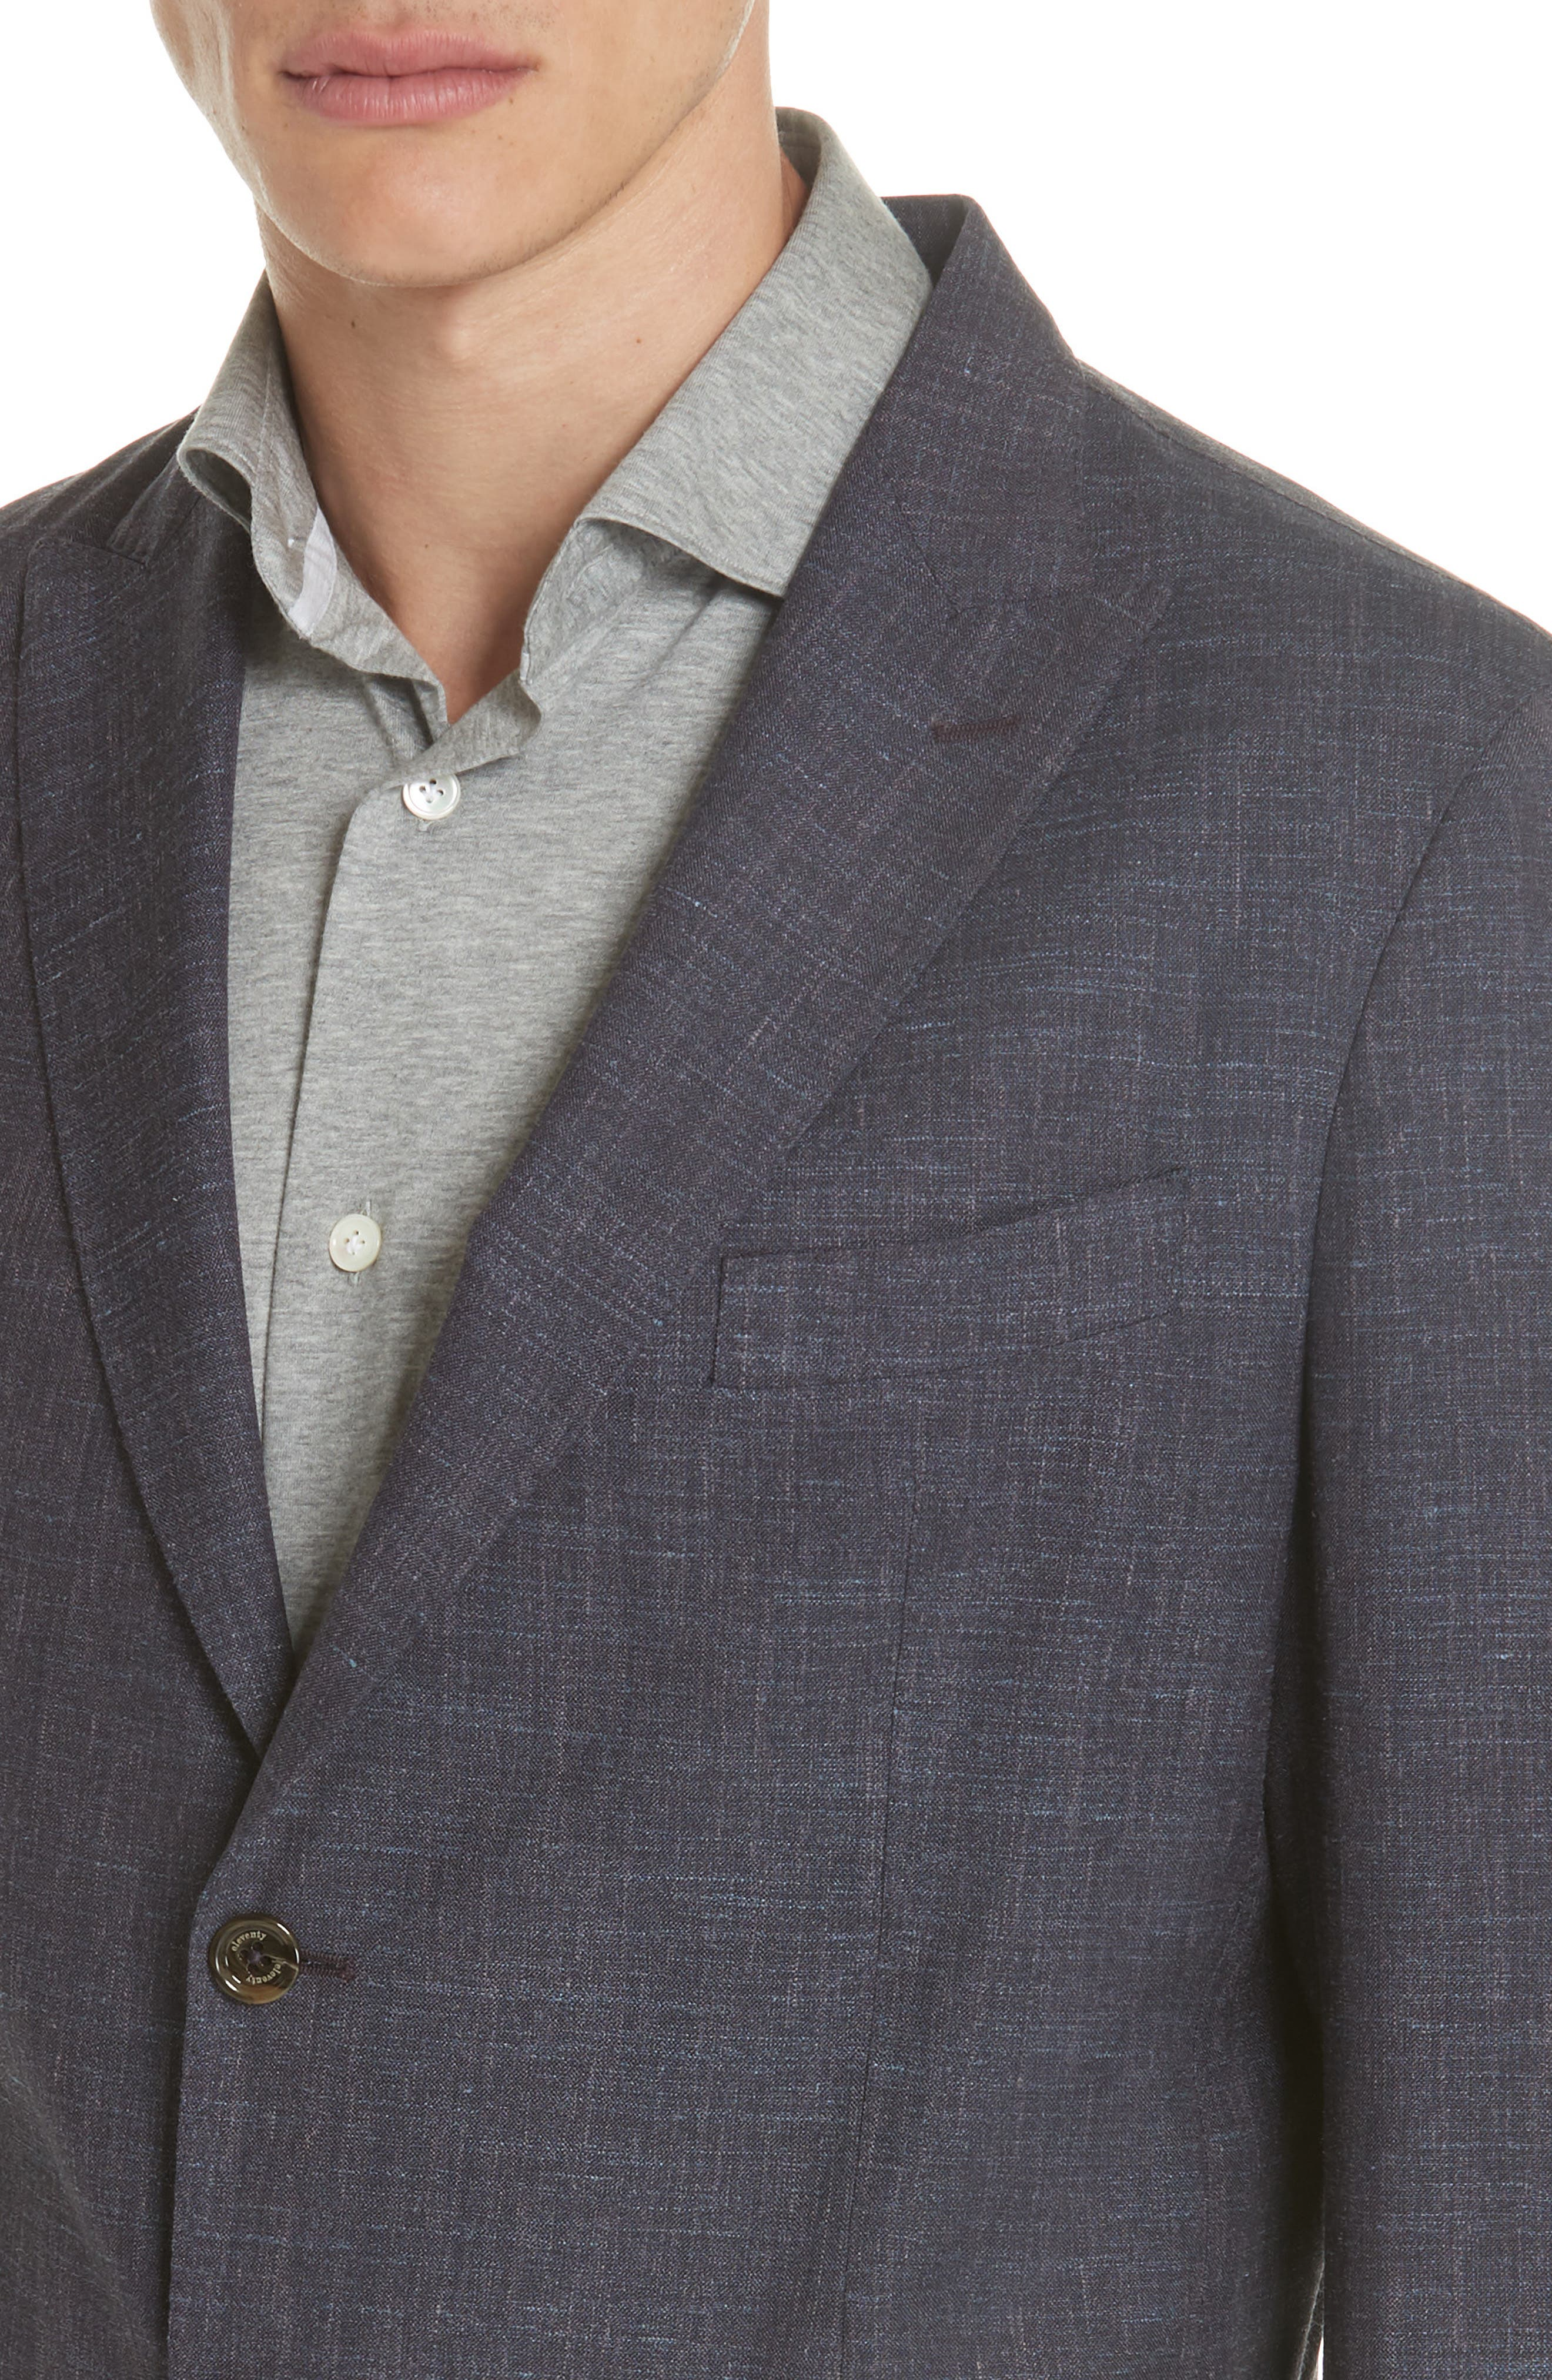 Trim Fit Wool Blend Blazer,                             Alternate thumbnail 4, color,